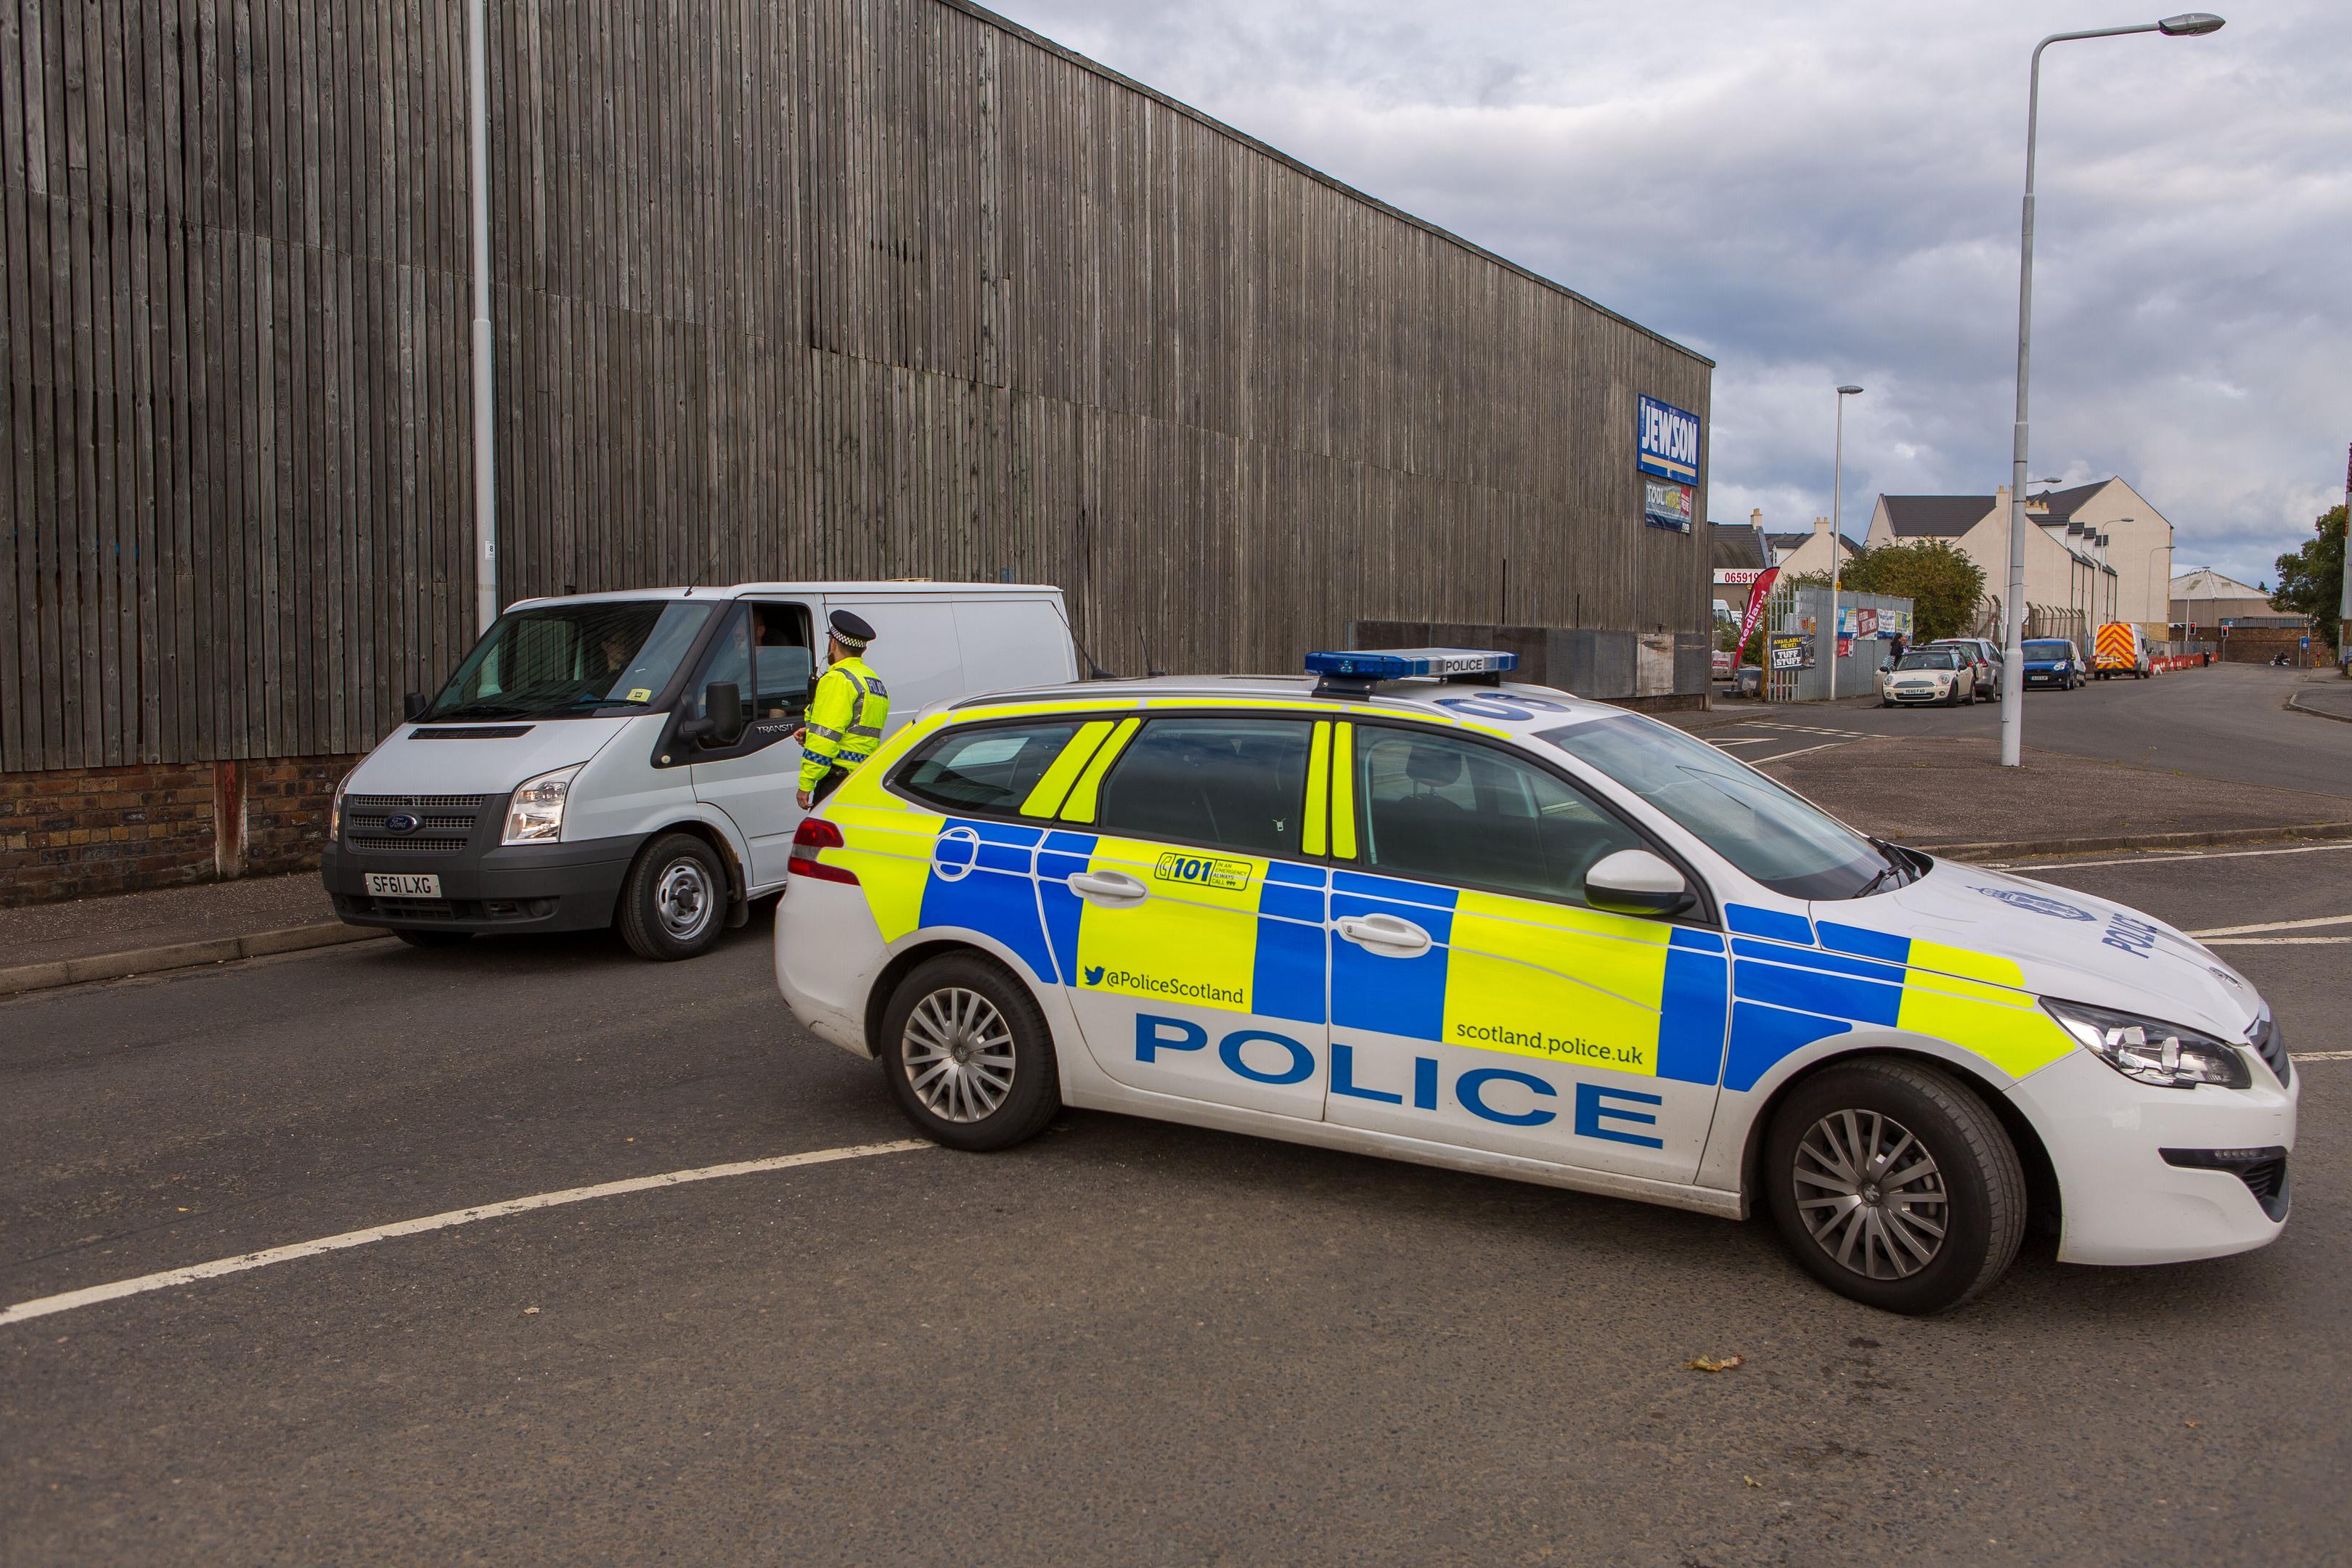 The scene in Denburn Road, Kirkcaldy, last Thursday after the body of missing Libbi Toledo was found.